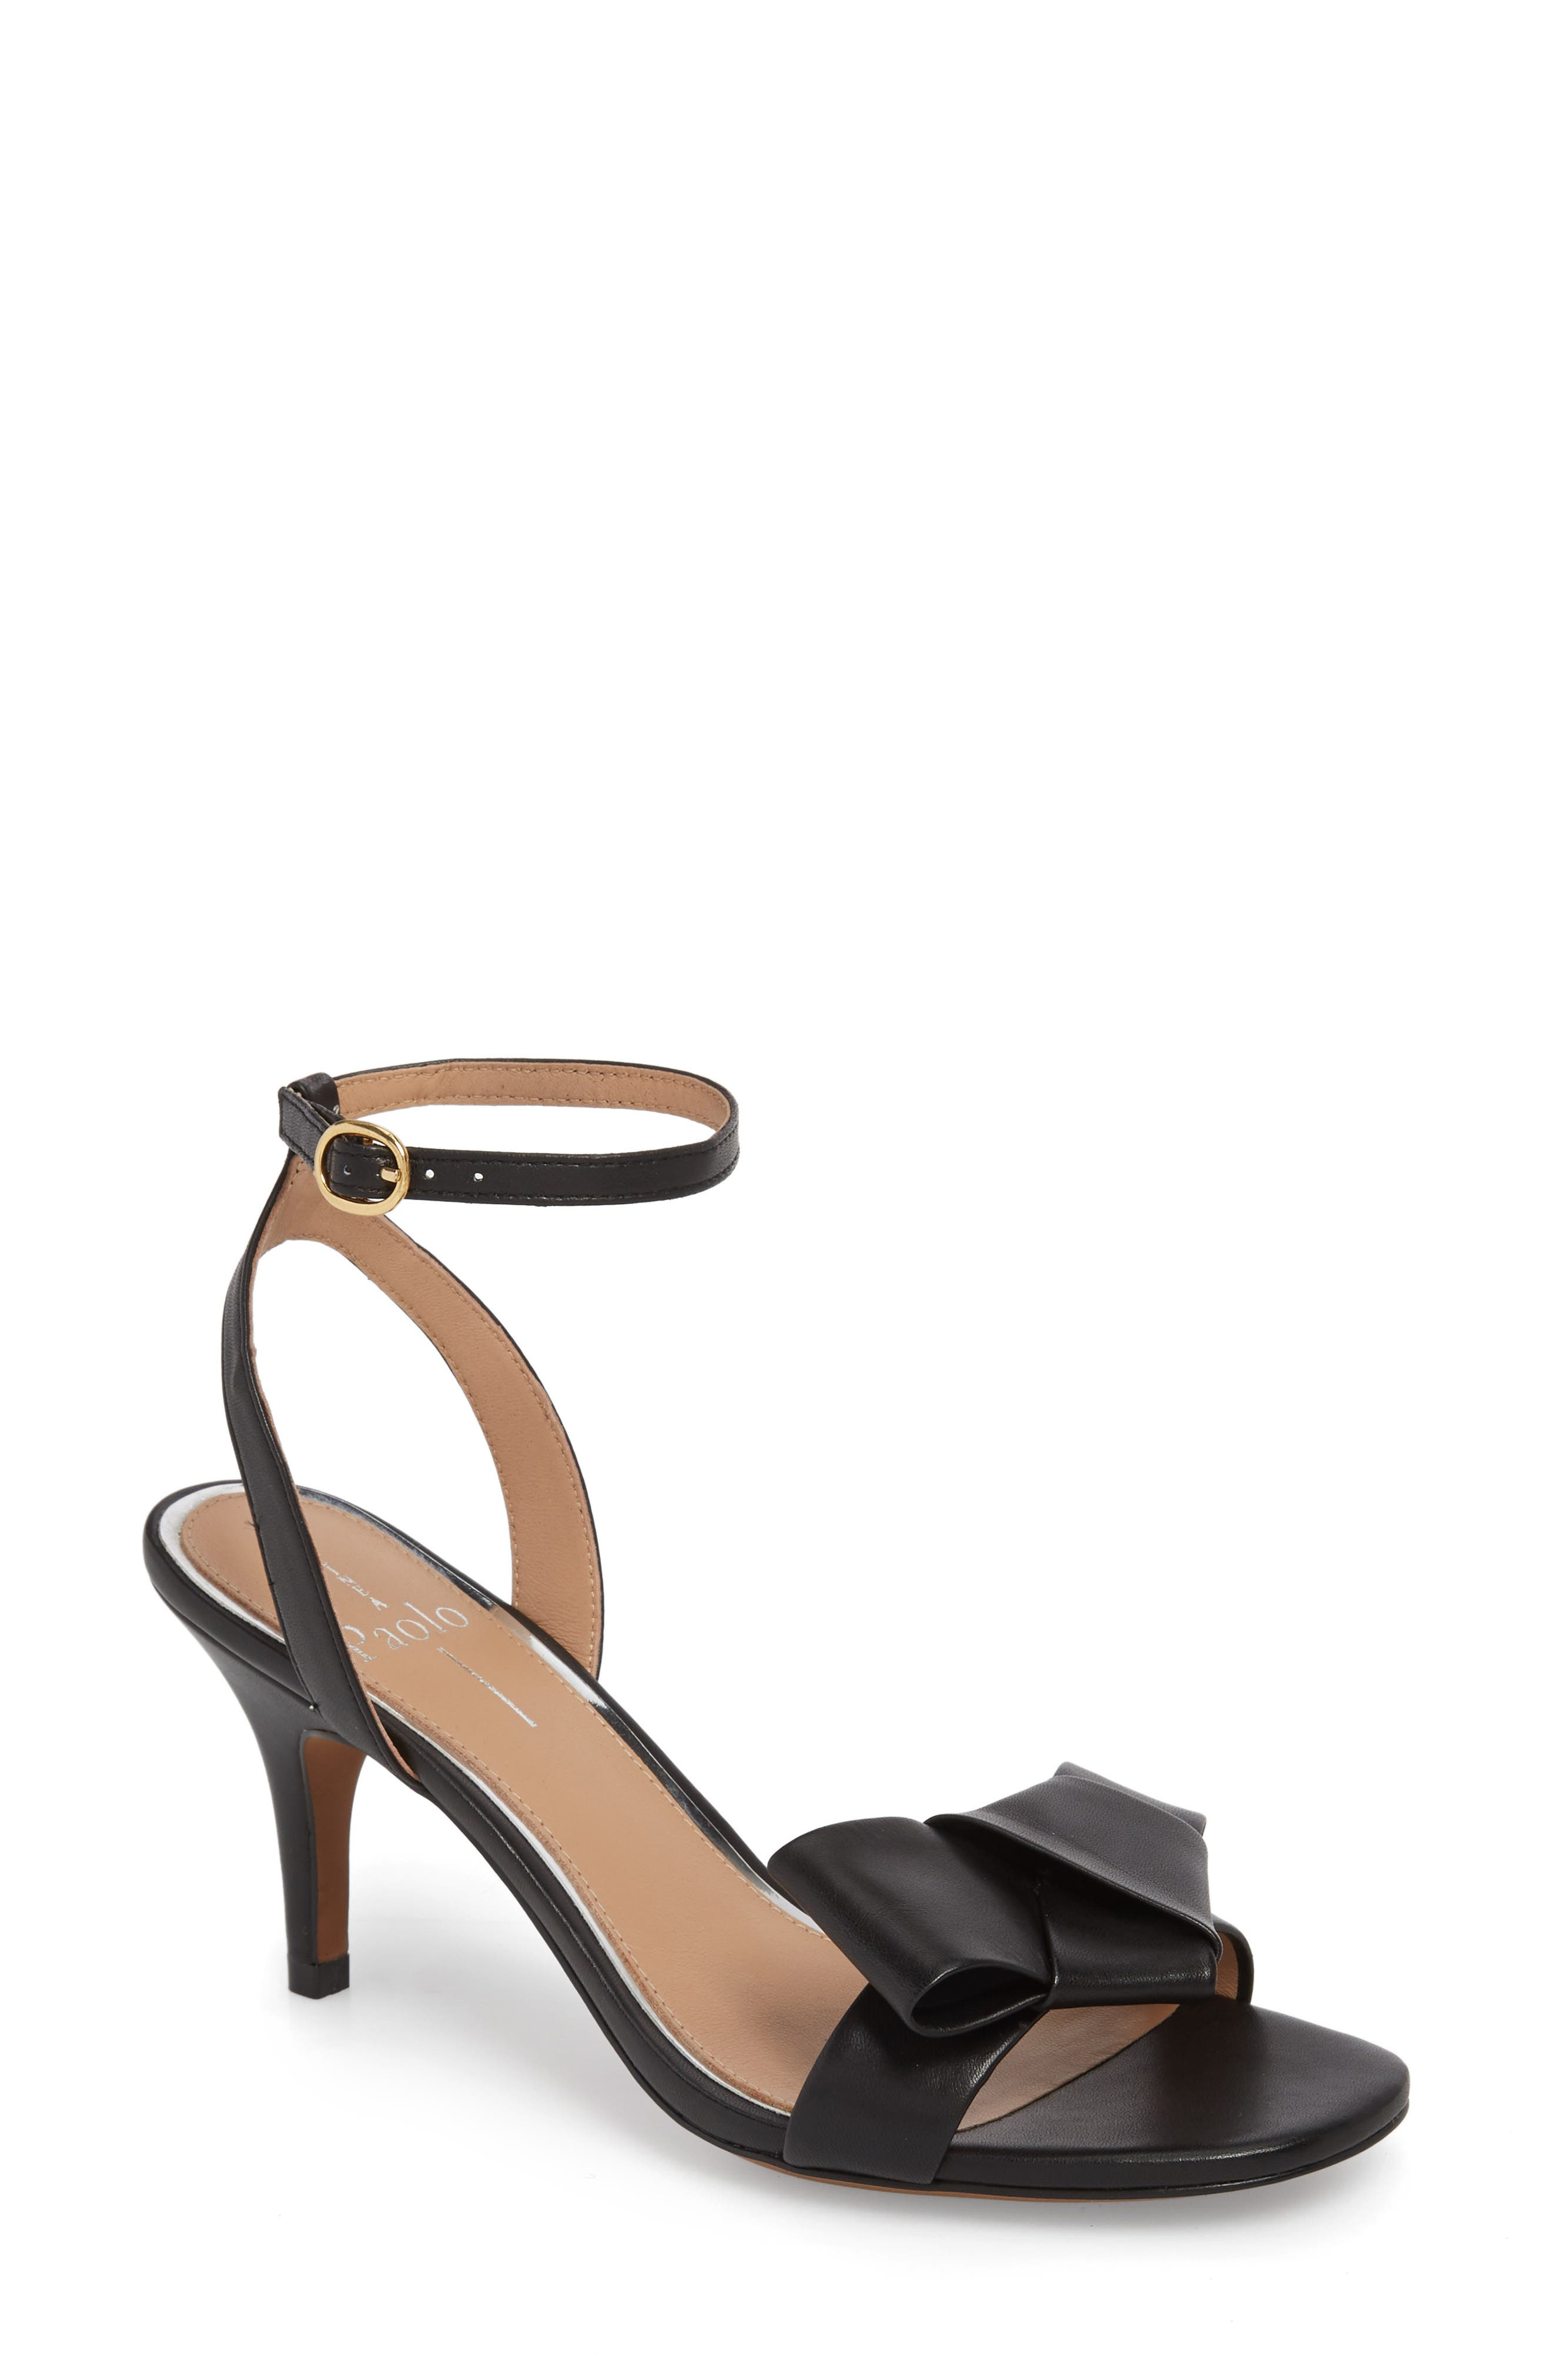 Haven Ankle Strap Sandal,                         Main,                         color, BLACK LEATHER